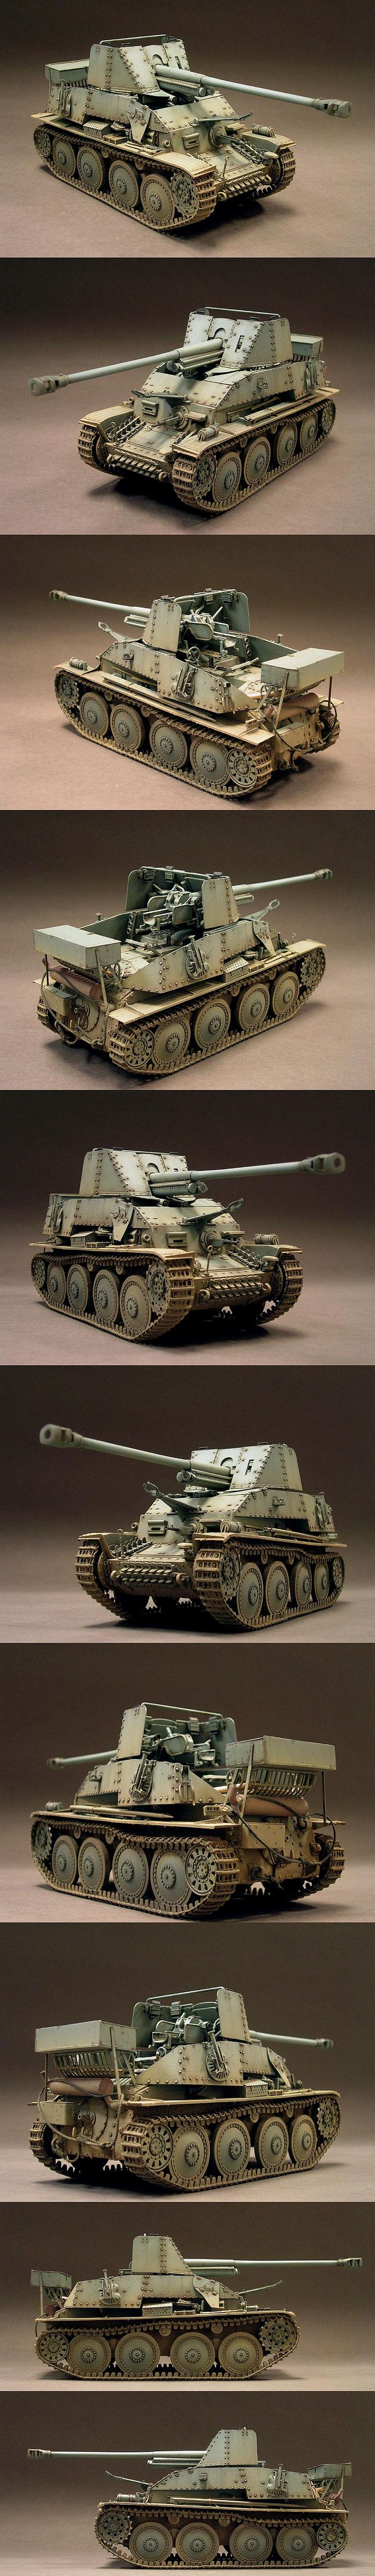 Marder III 1/35 Scale Model